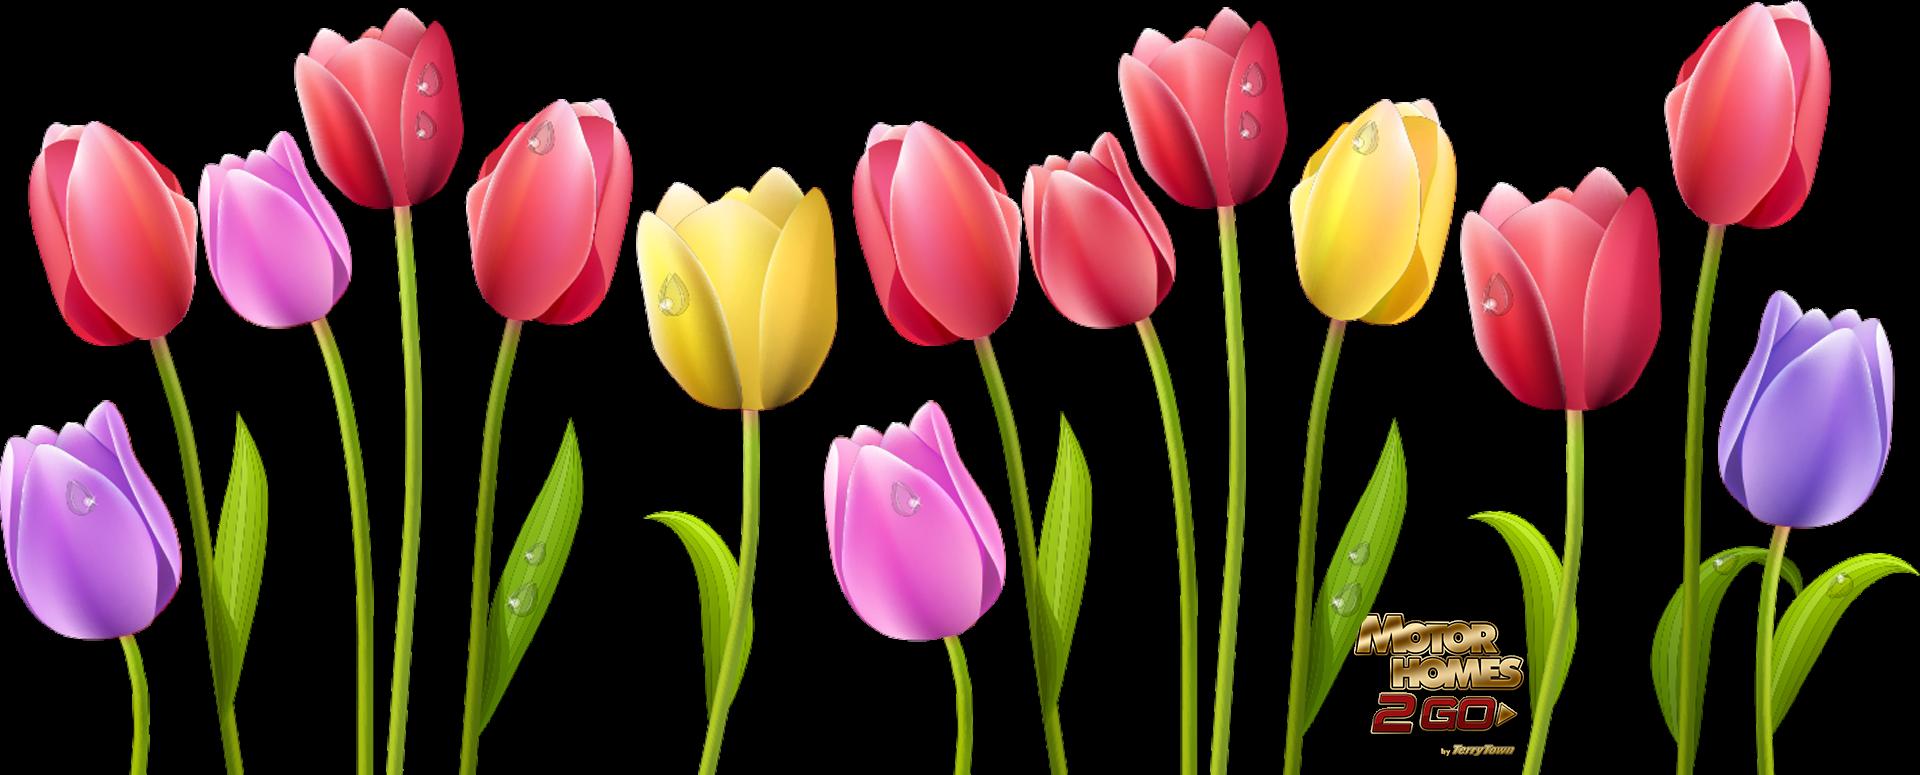 vector royalty free stock Indira Gandhi Memorial Tulip Garden Flower Computer Icons Clip art